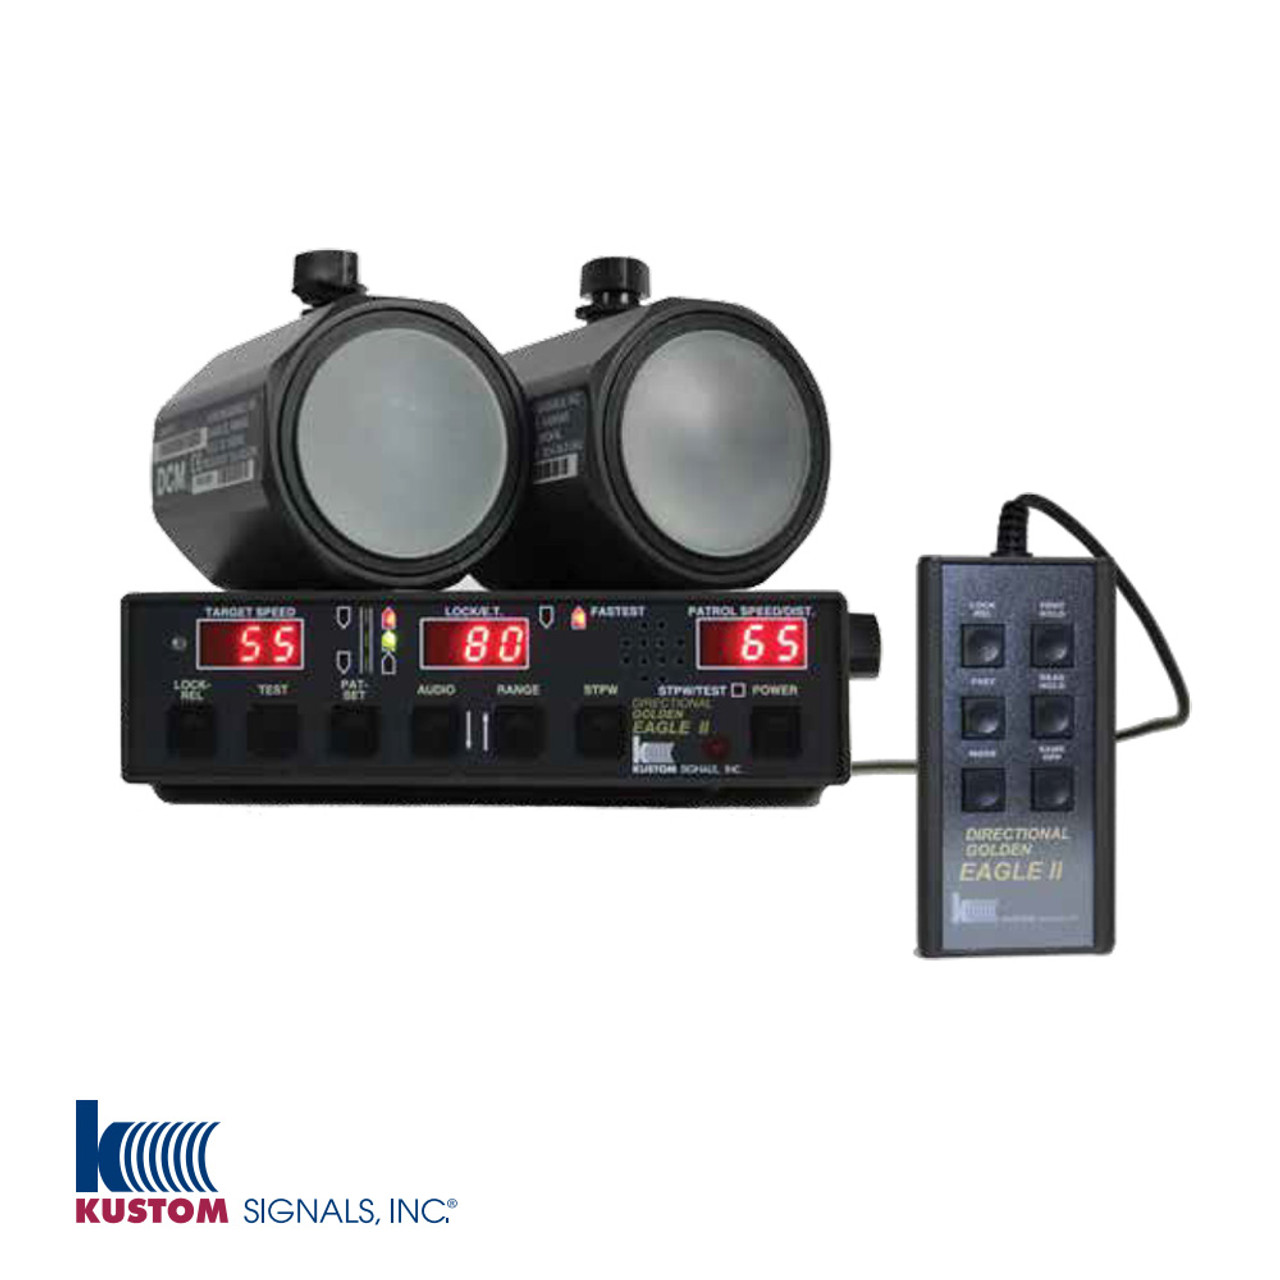 Kustom Signals Golden Eagle II Ka-Band DCM Dash-Mounted Police Radar, single or dual antenna, same direction mode